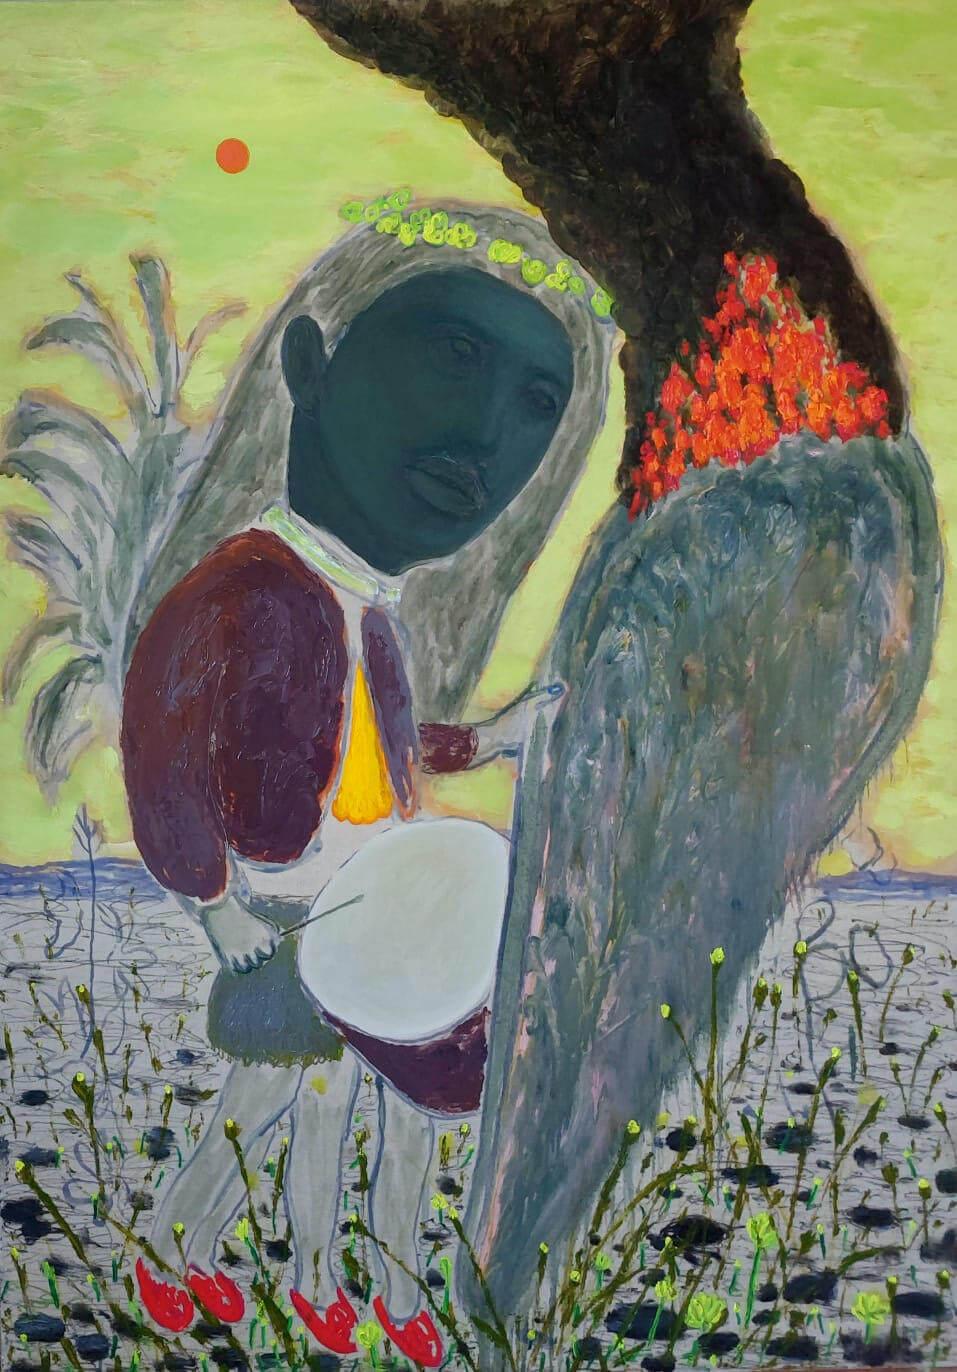 GRGUR AKRAP - Lažni prorok / False oracle, 2021. ulje i enkaustika na platnu / oil and encaustics on canvas 80x60cm